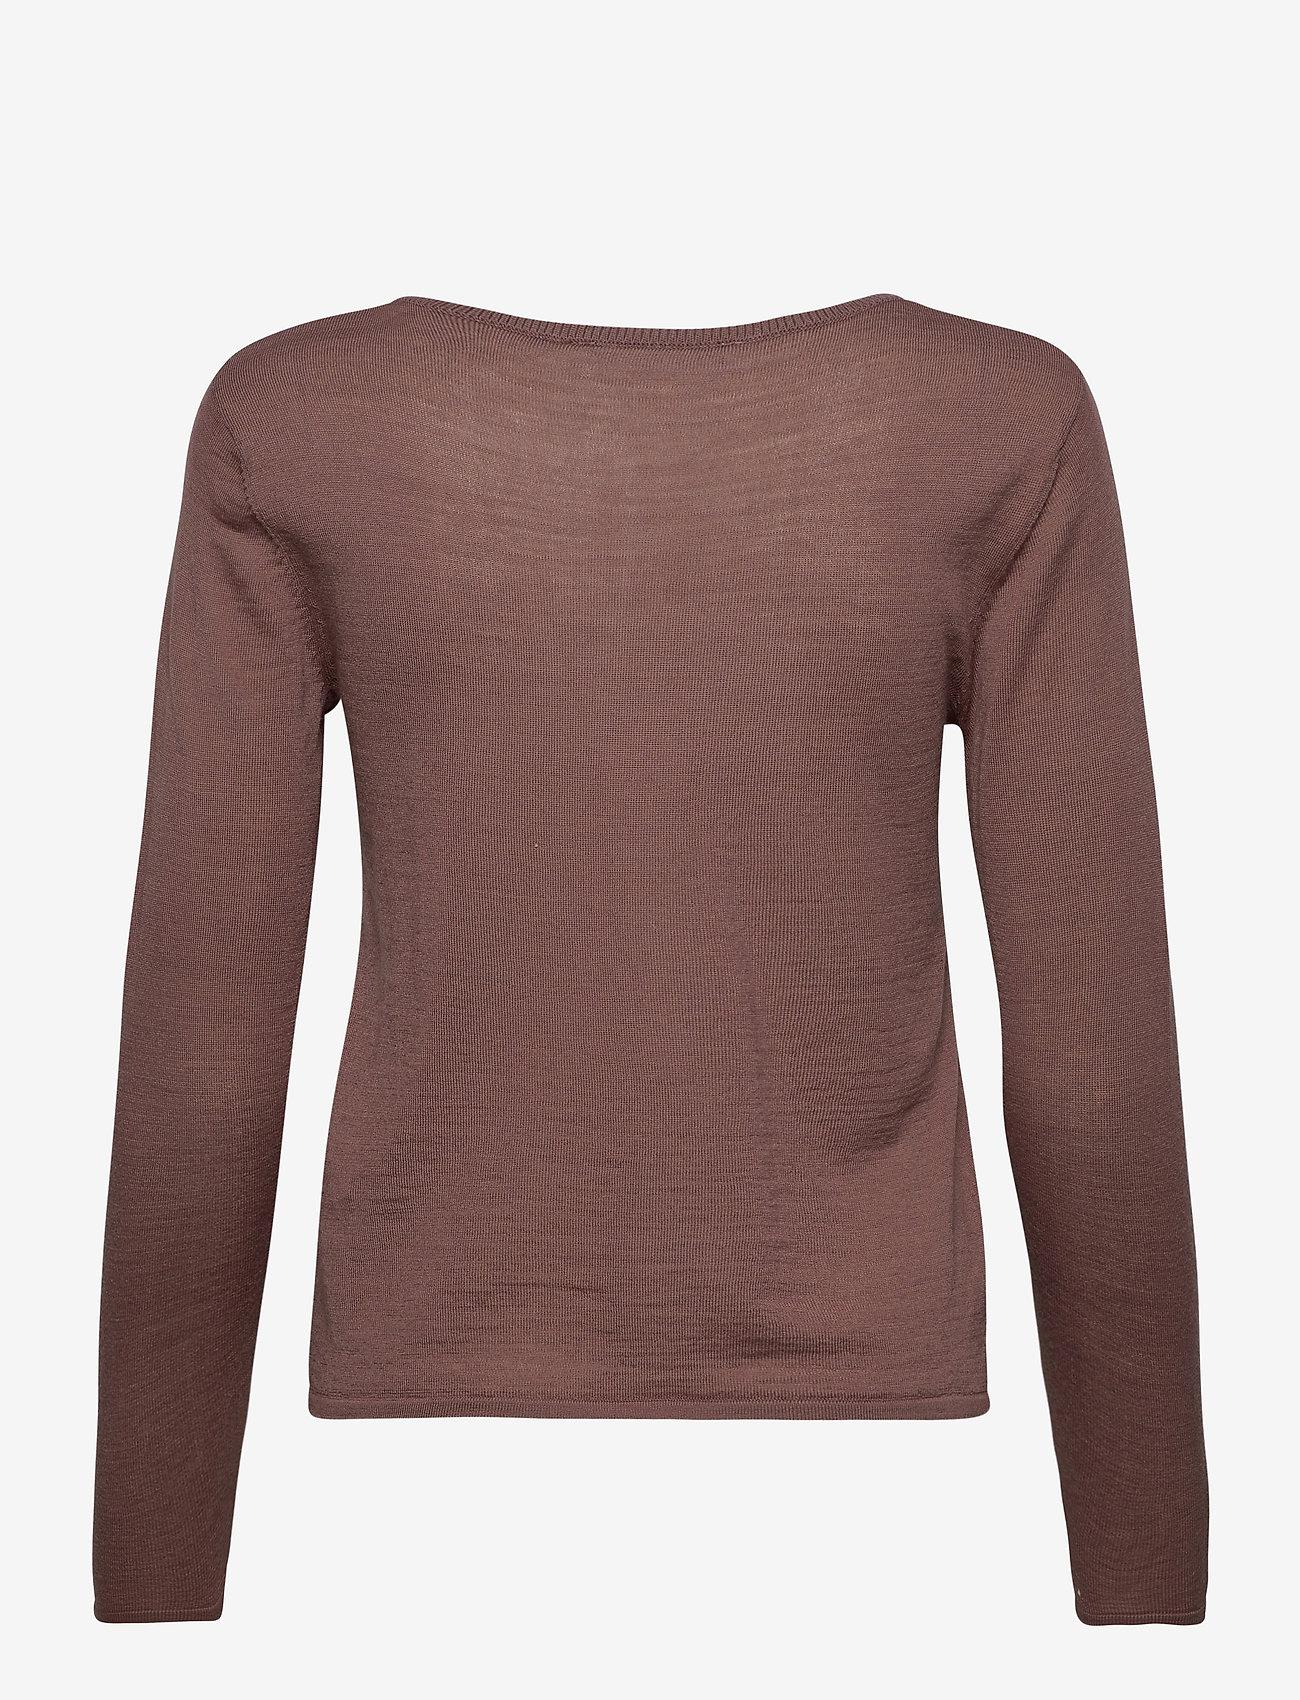 Rosemunde - Merino pullover ls - truien - dusty plum - 1